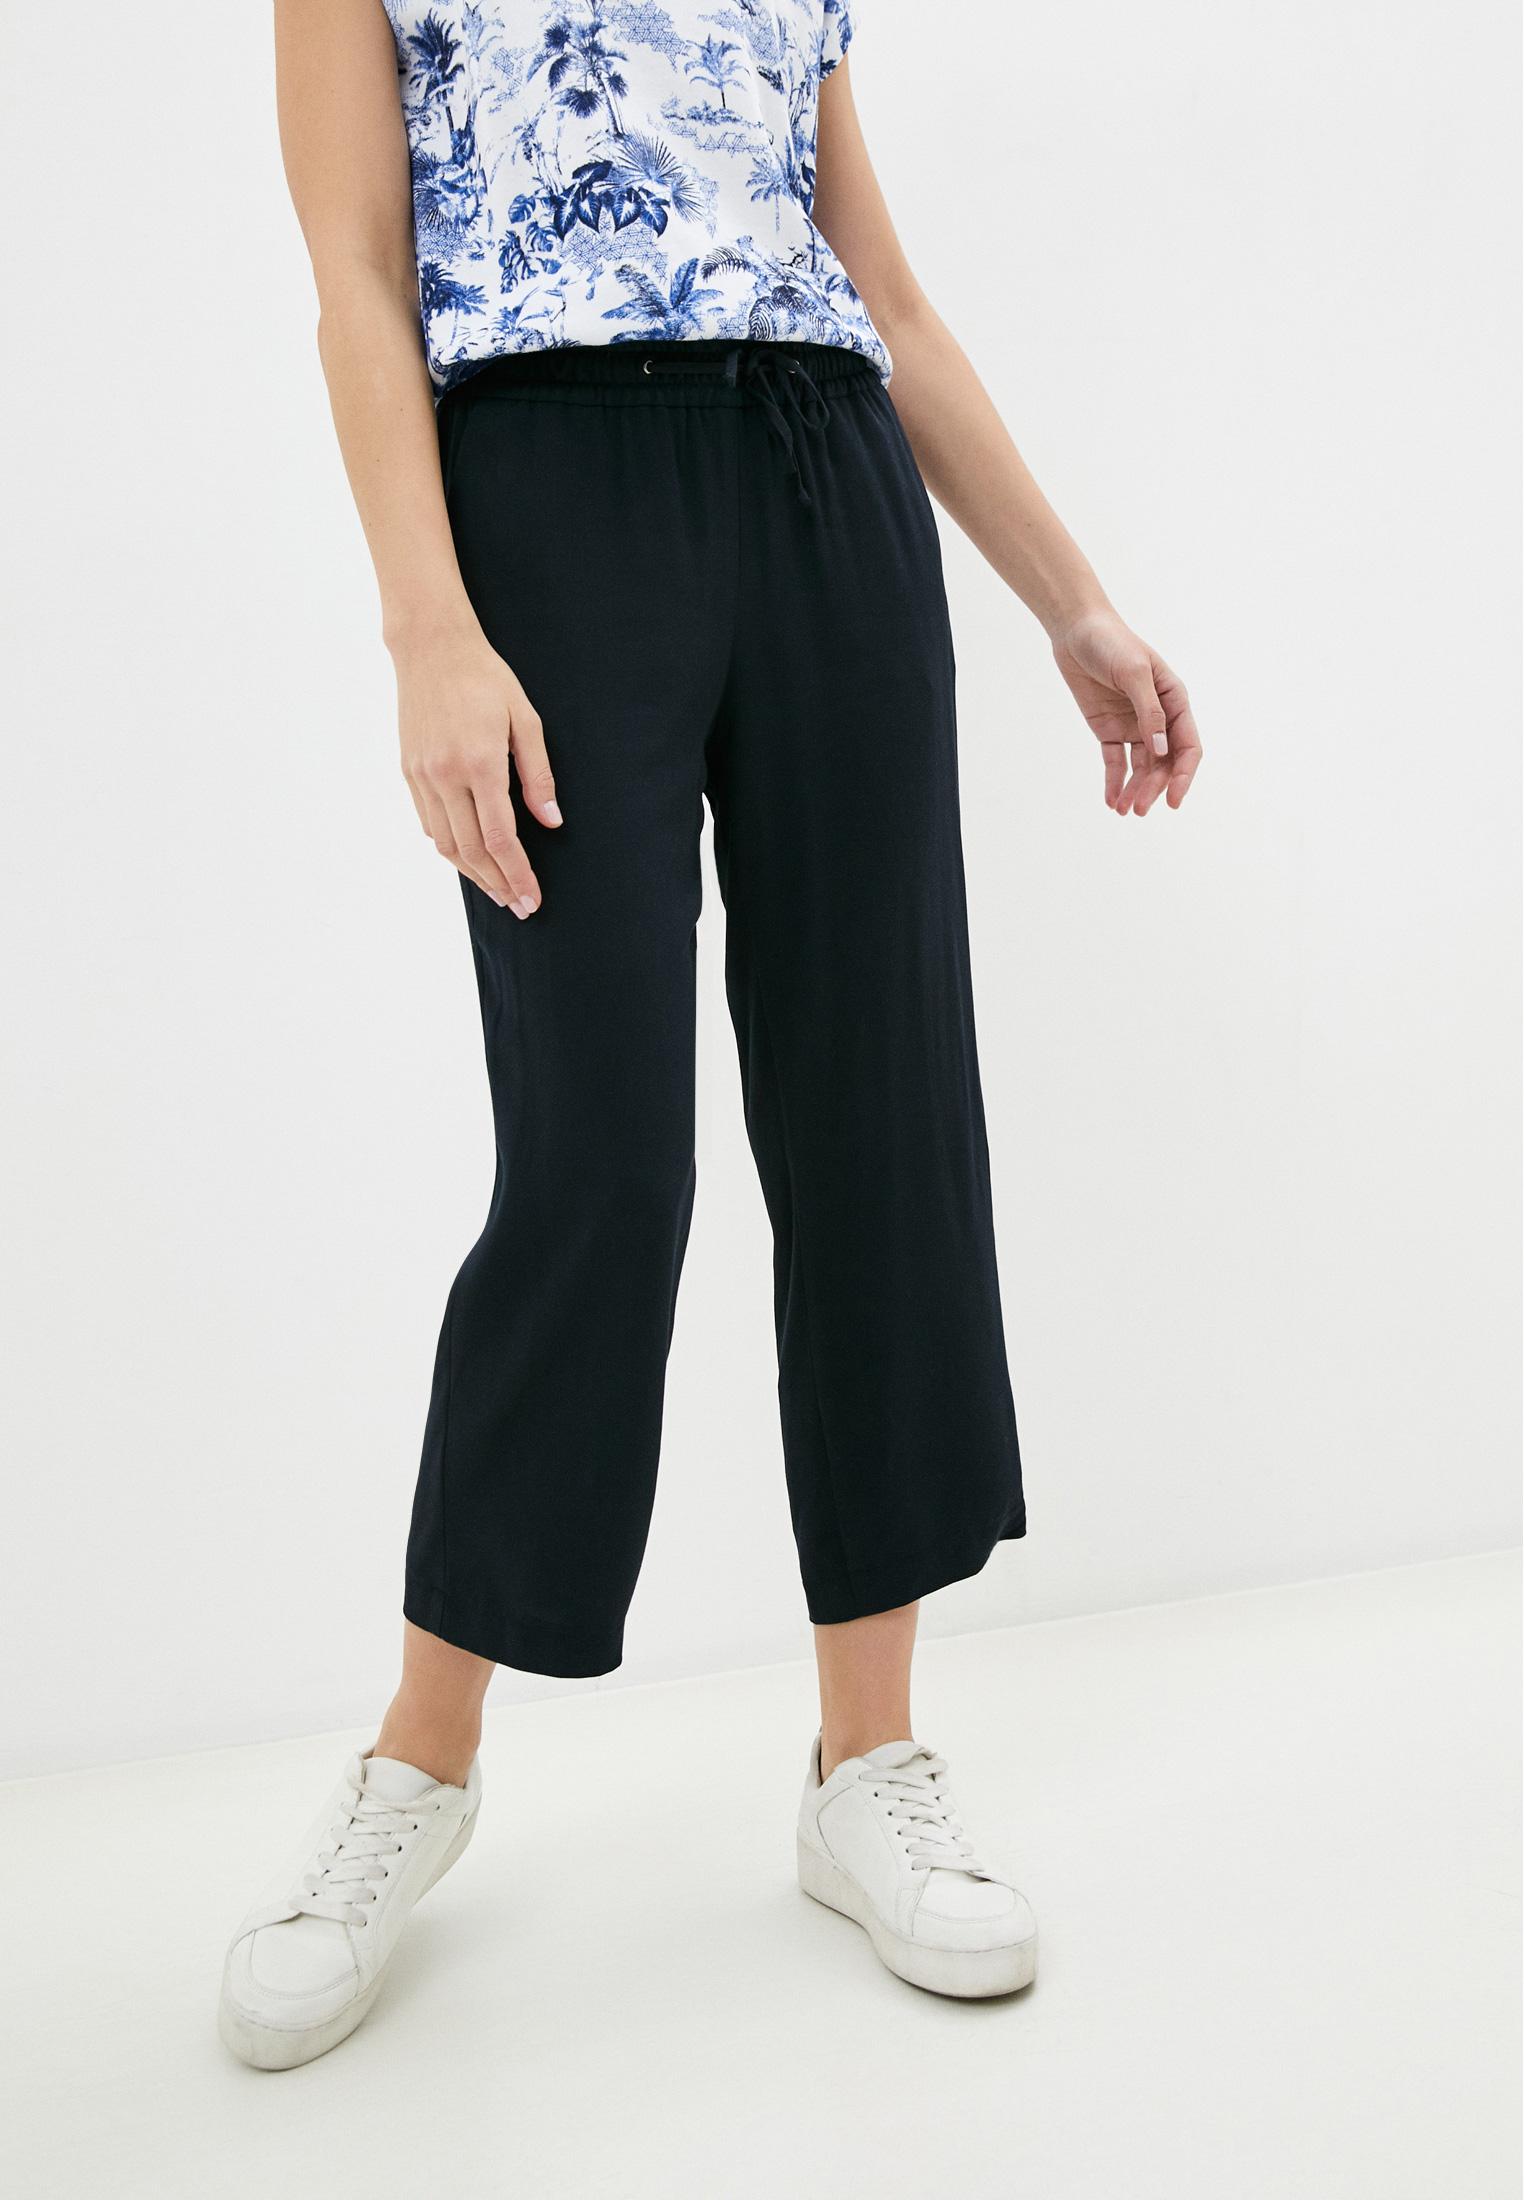 Женские брюки Gerry Weber (Гарри Вебер) 222211-67601